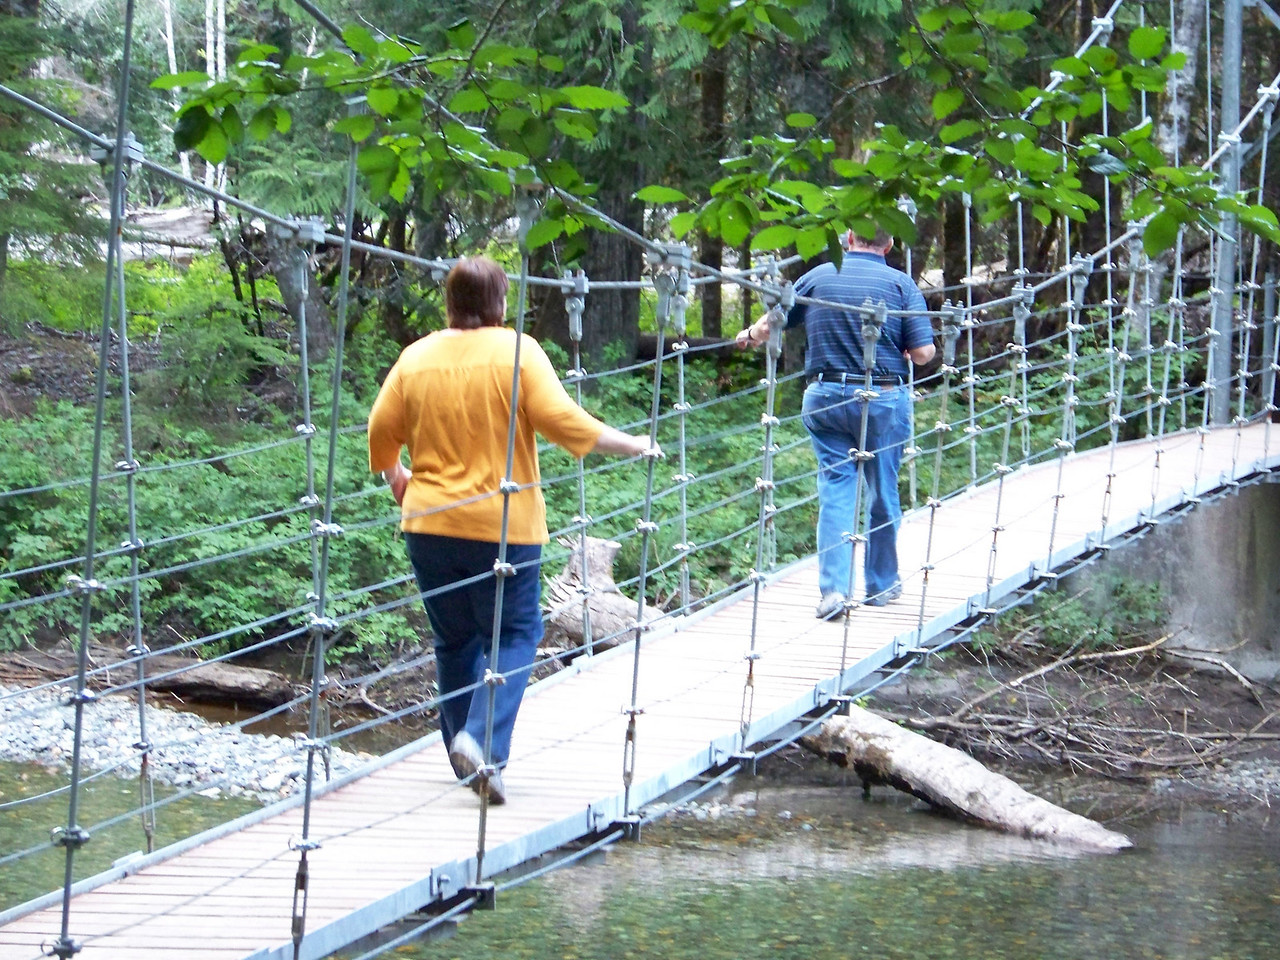 The bridge over the Ohanapecosh River was very bouncy!<br /> [Mount Rainier - Grove of the Patriarchs]